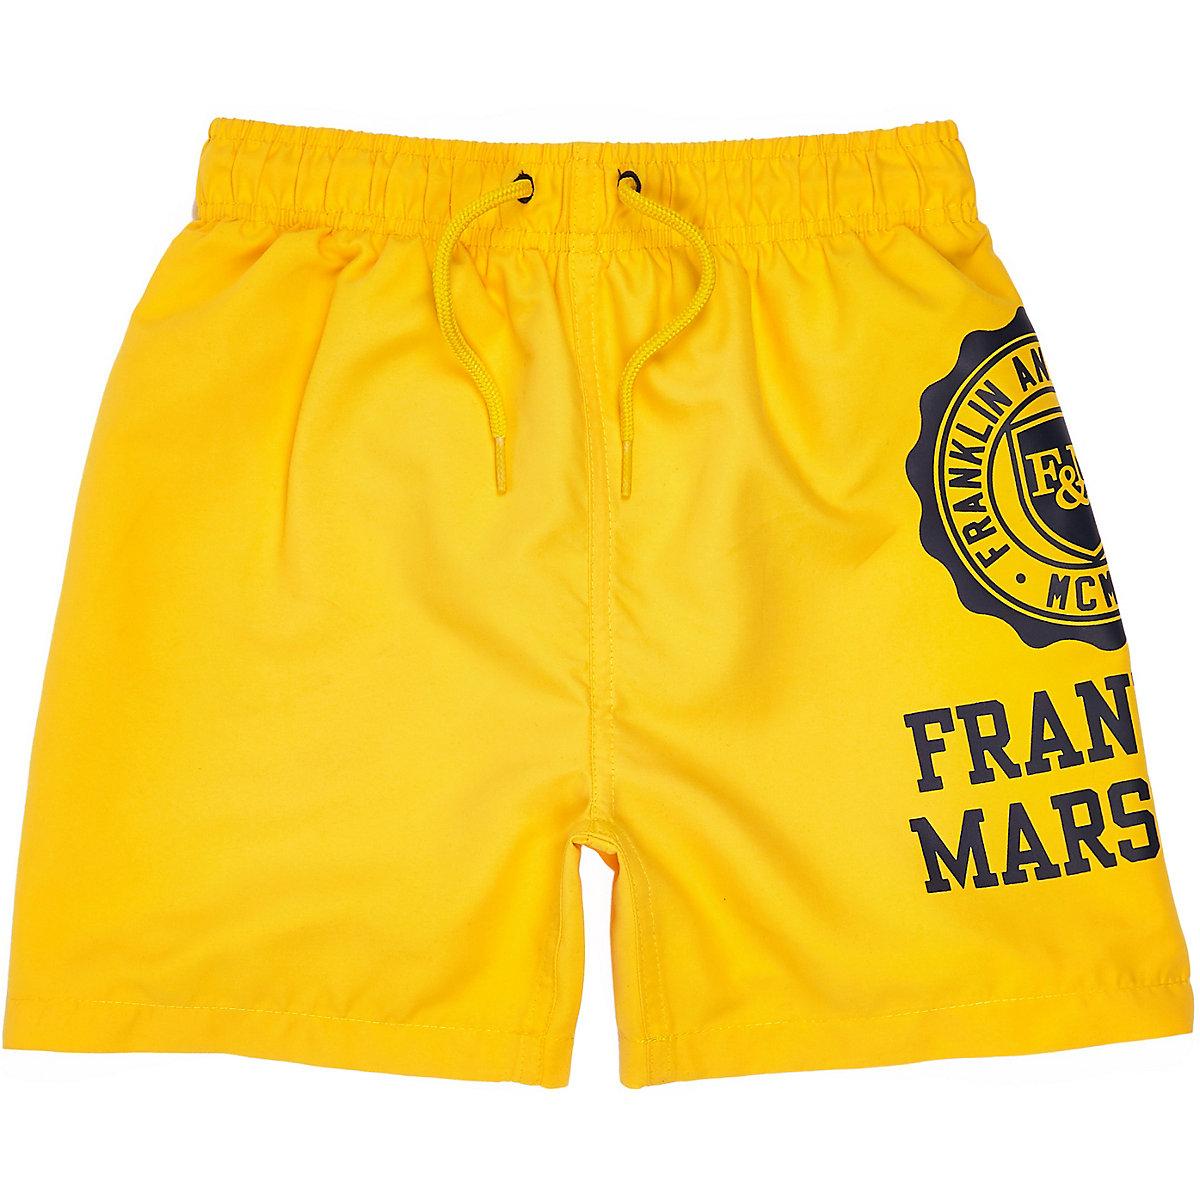 Boys yellow Franklin & Marshall swim trunks